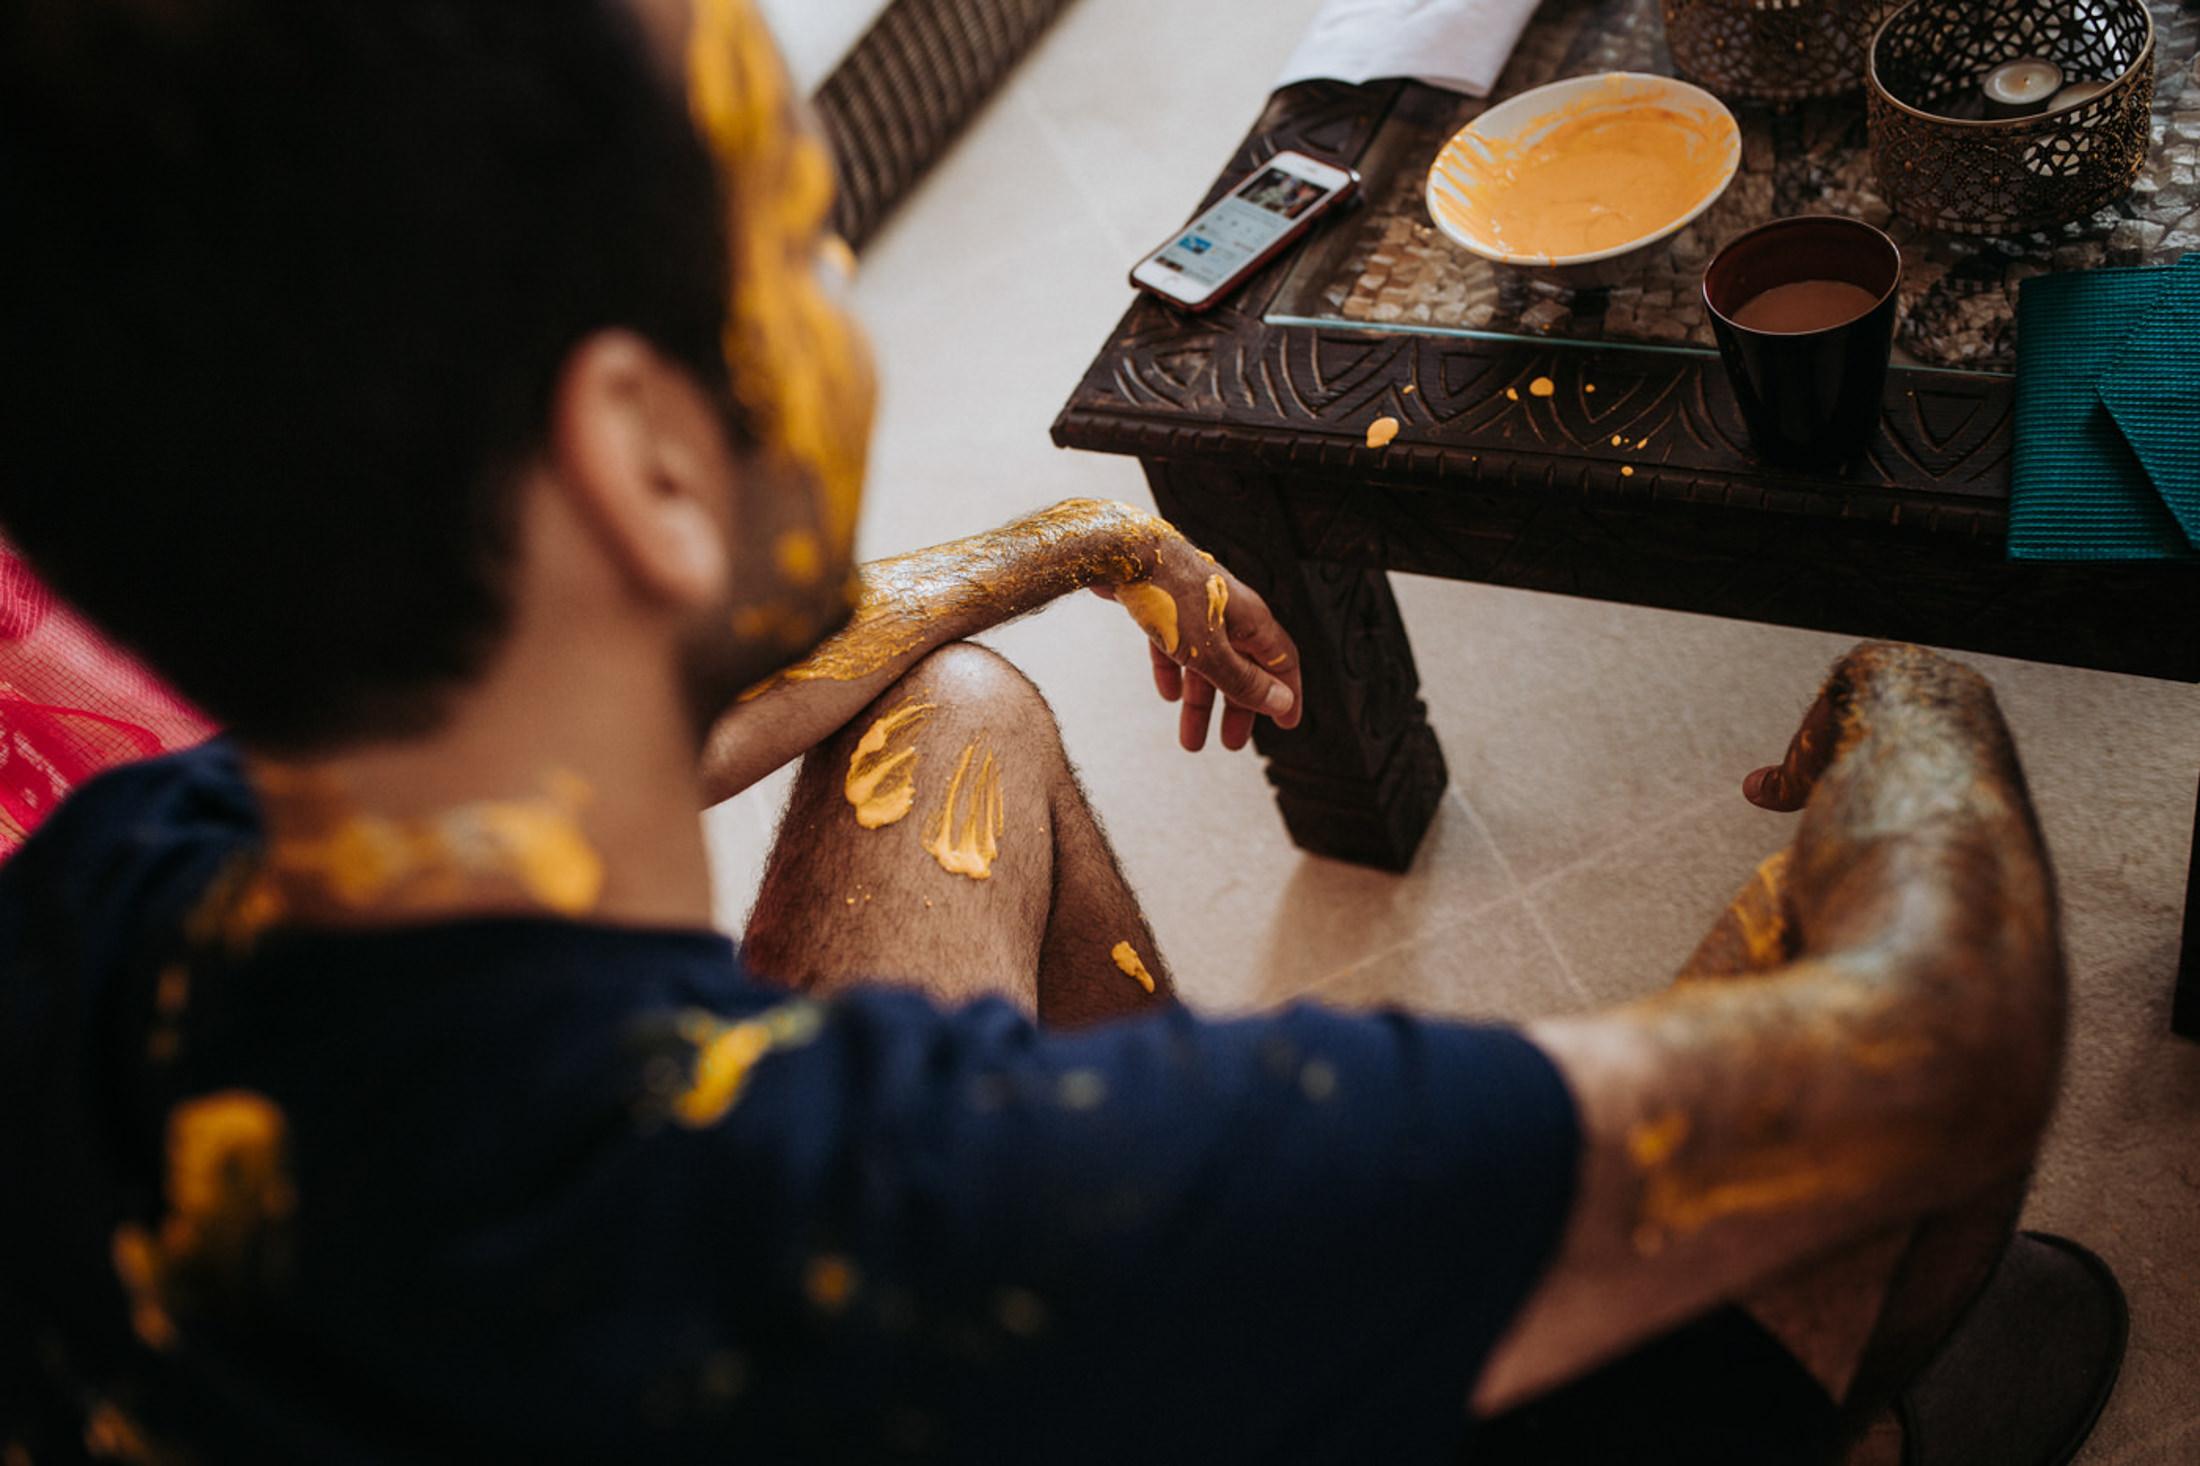 Wedding_Photographer_Mallorca_Daniela-Marquardt_Photography_New_York_Iceland_Tuscany_Santorini_Portugal_Austria_Bavaria_Elopement_Hochzeitsfotograf_AntjeRajat2_14